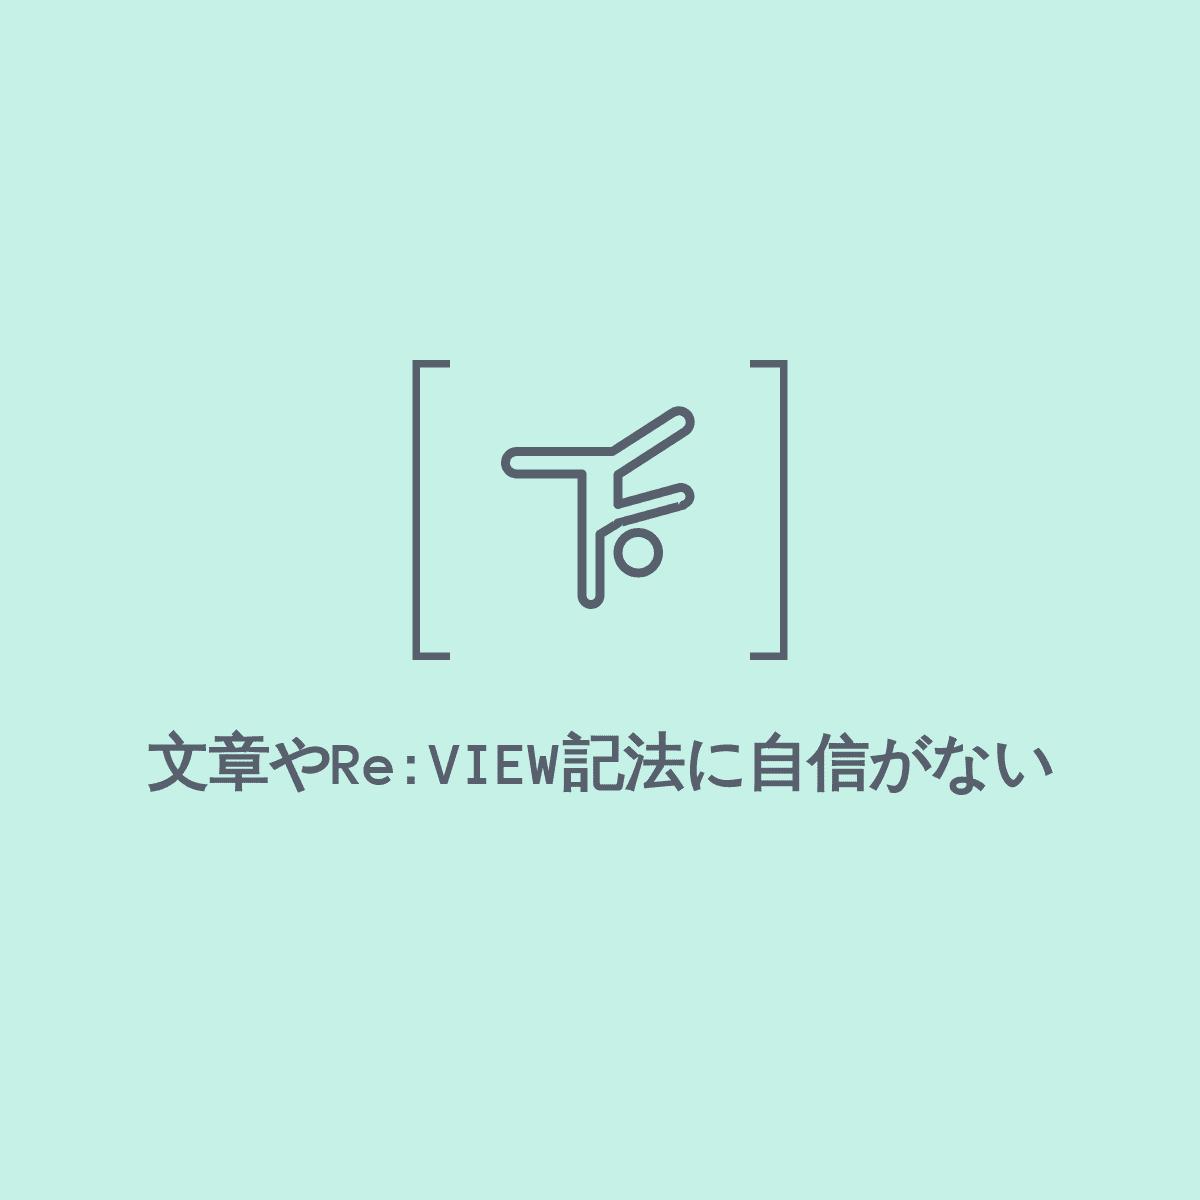 f:id:kic-yuuki:20190321112359p:plain